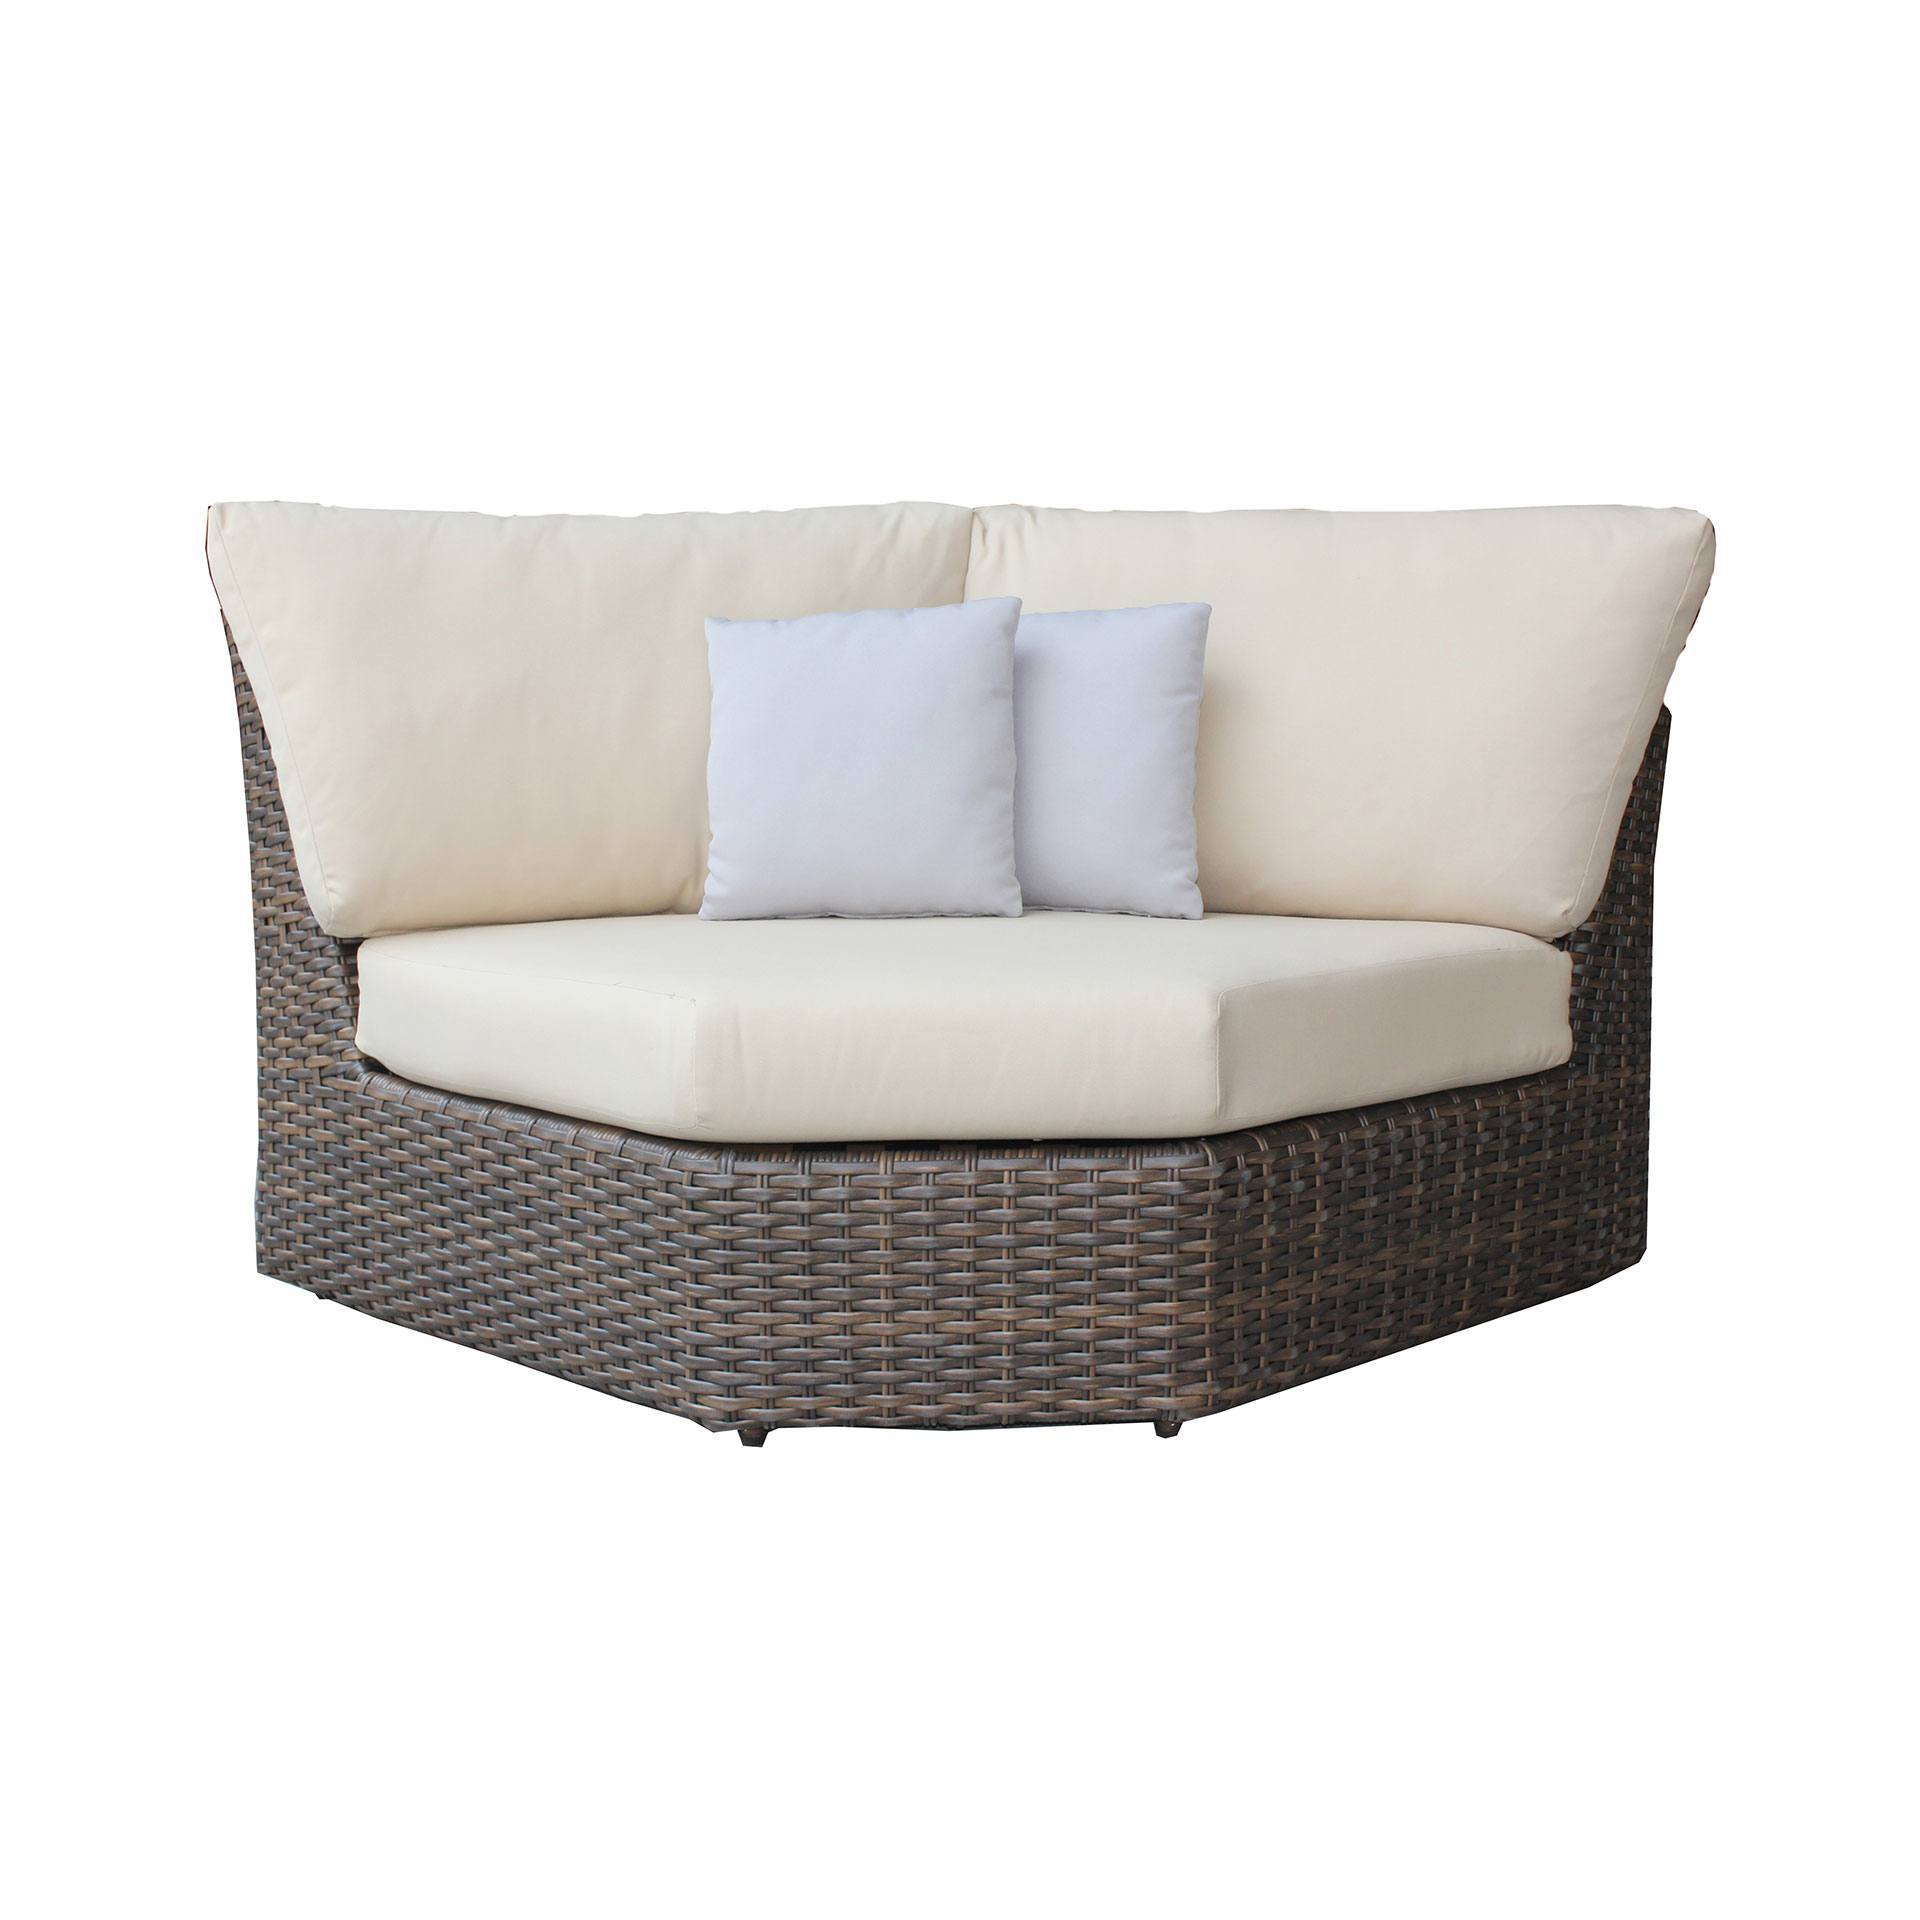 Ratana Portfino Sectional Curved Corner Chair Leisure Living